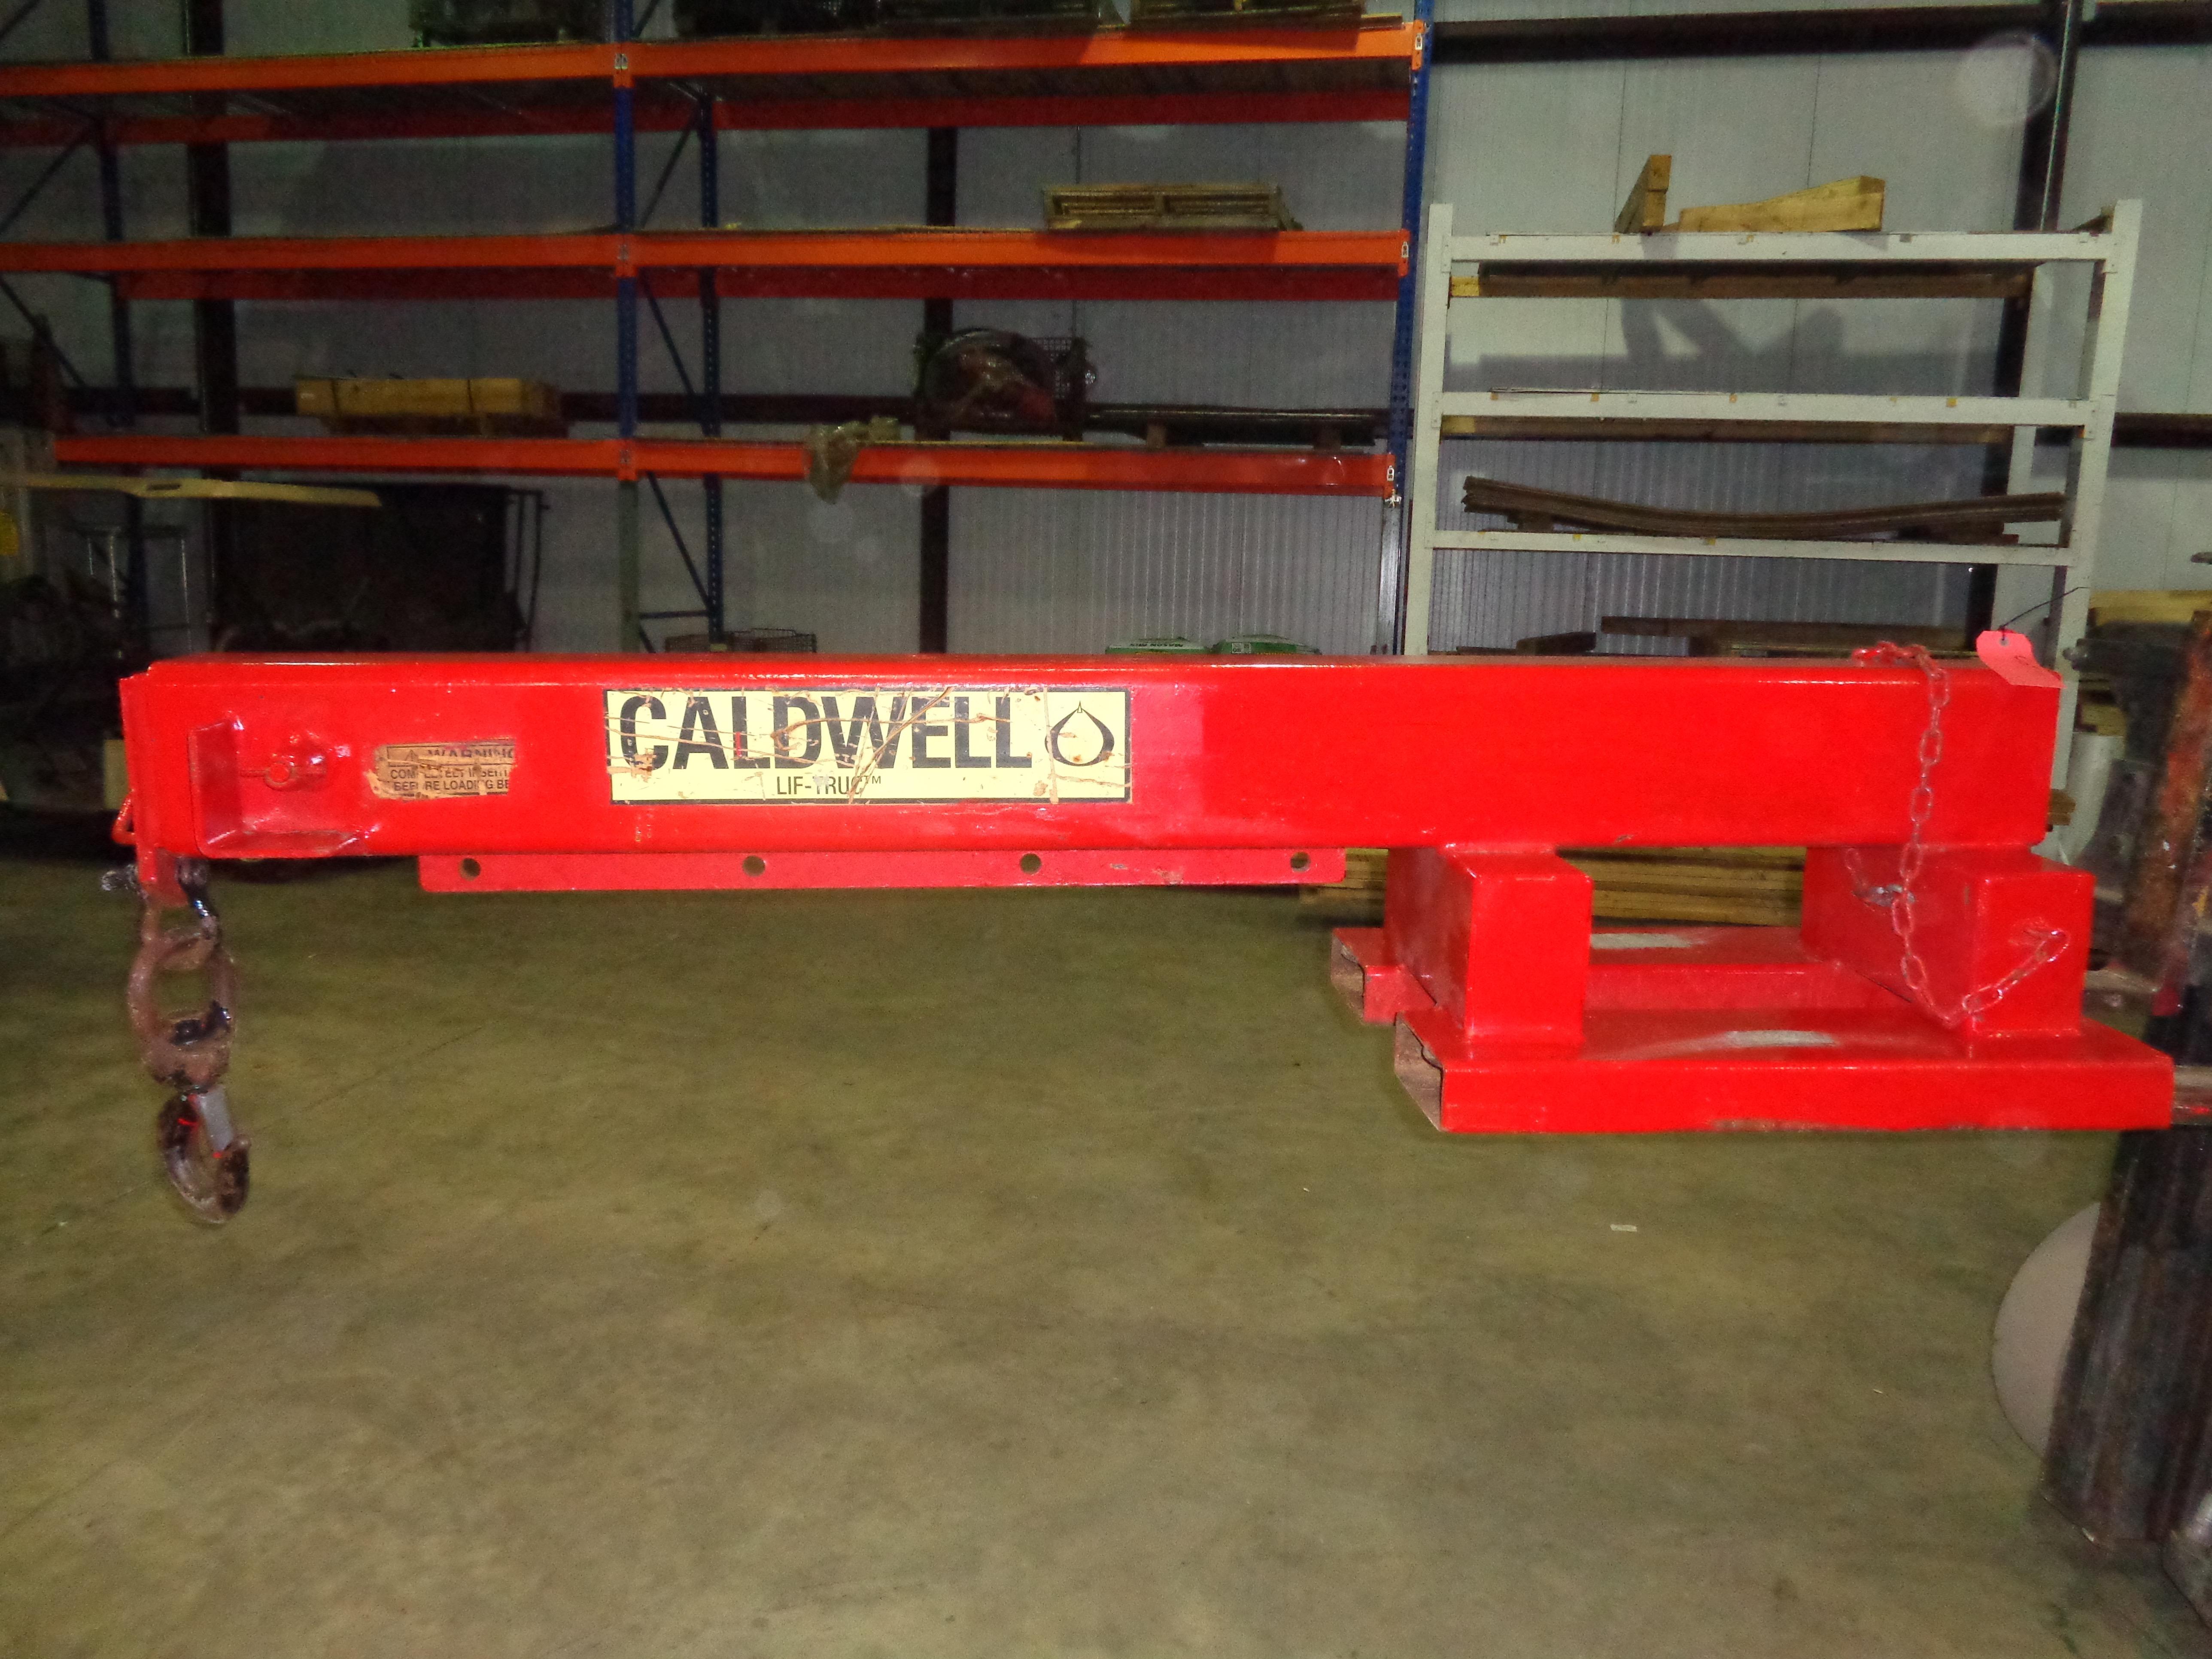 Caldwell FB-80 8,000 lb - Image 2 of 3